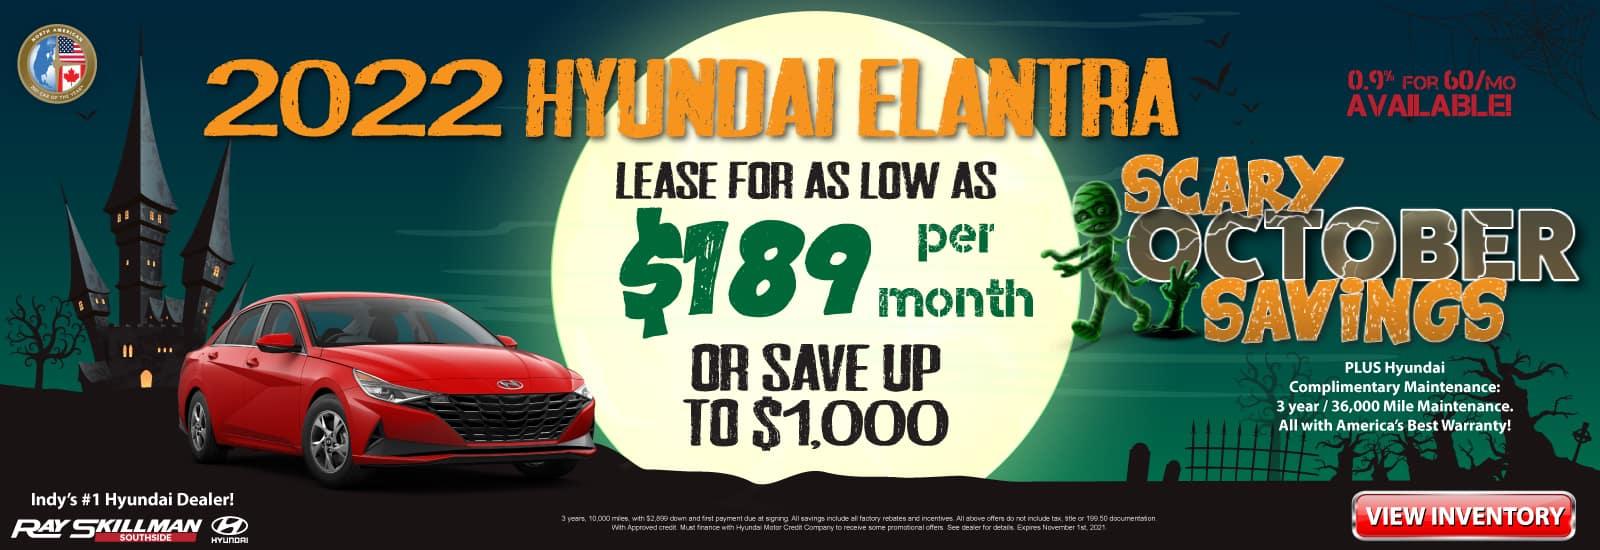 2022-Hyundai-Elantra-Web-Banner-1600×550 (003).jpg Oct